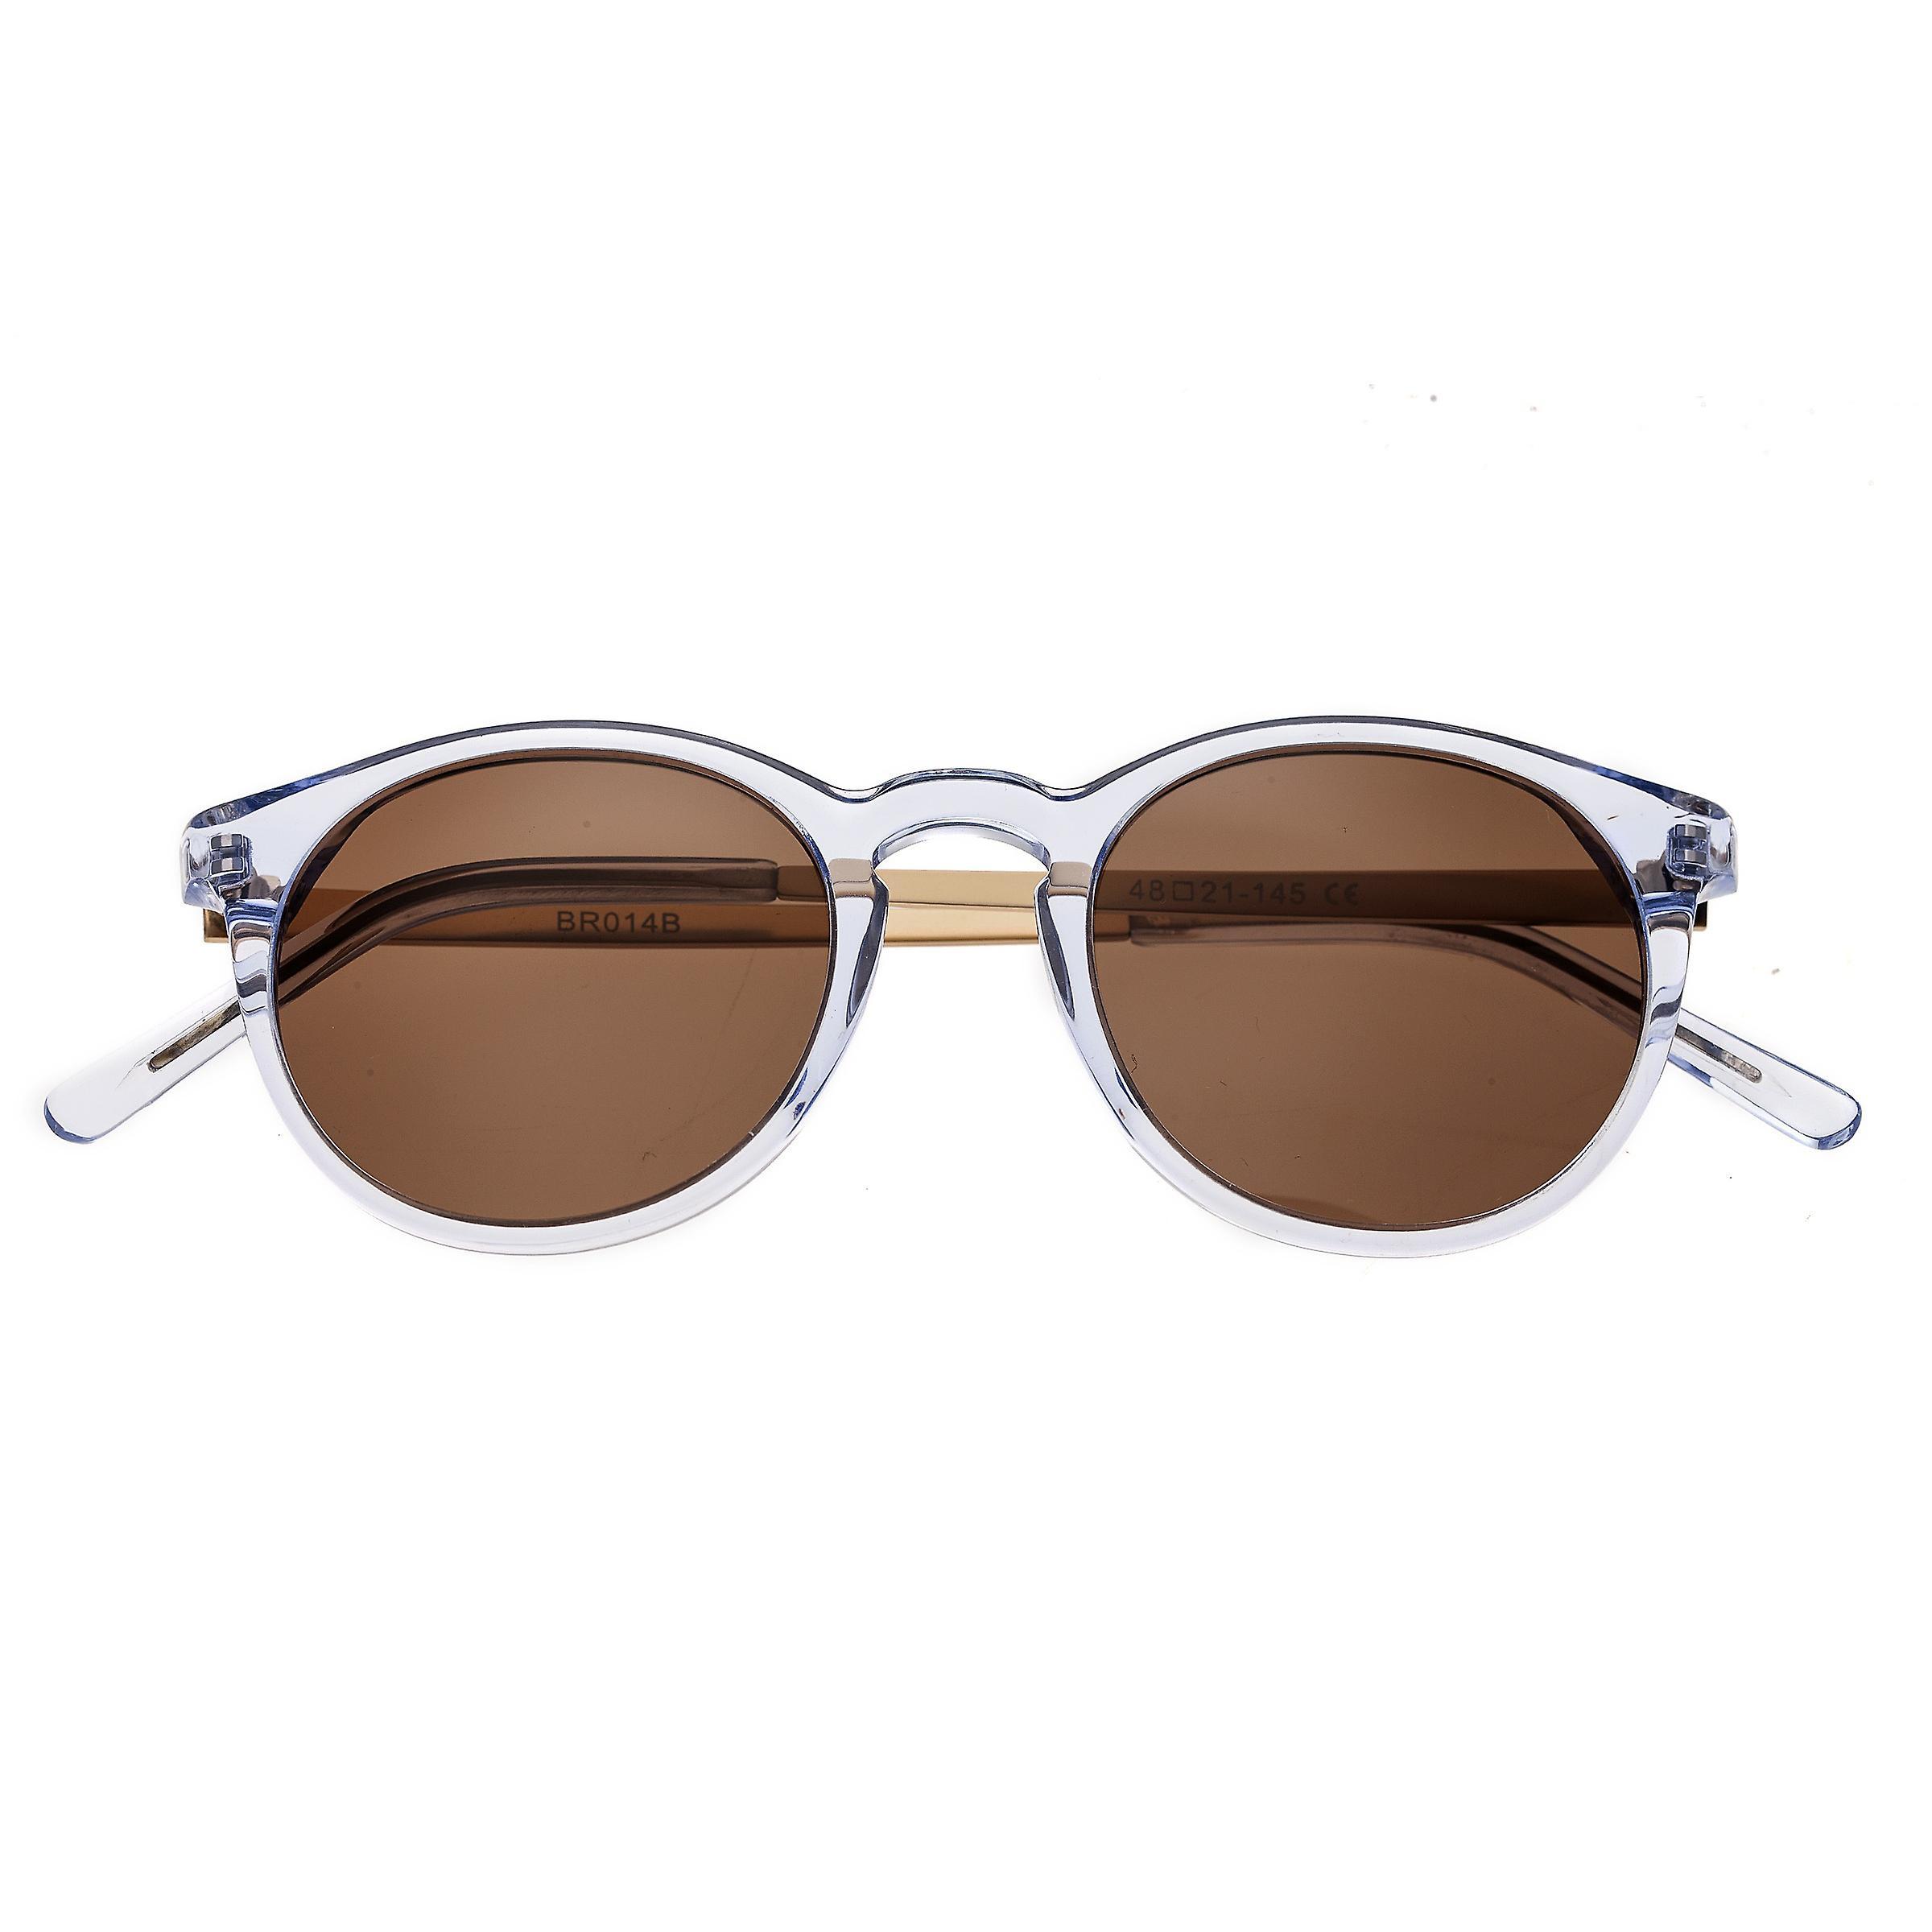 Bertha Hayley Polarized Sunglasses - Blue/Brown